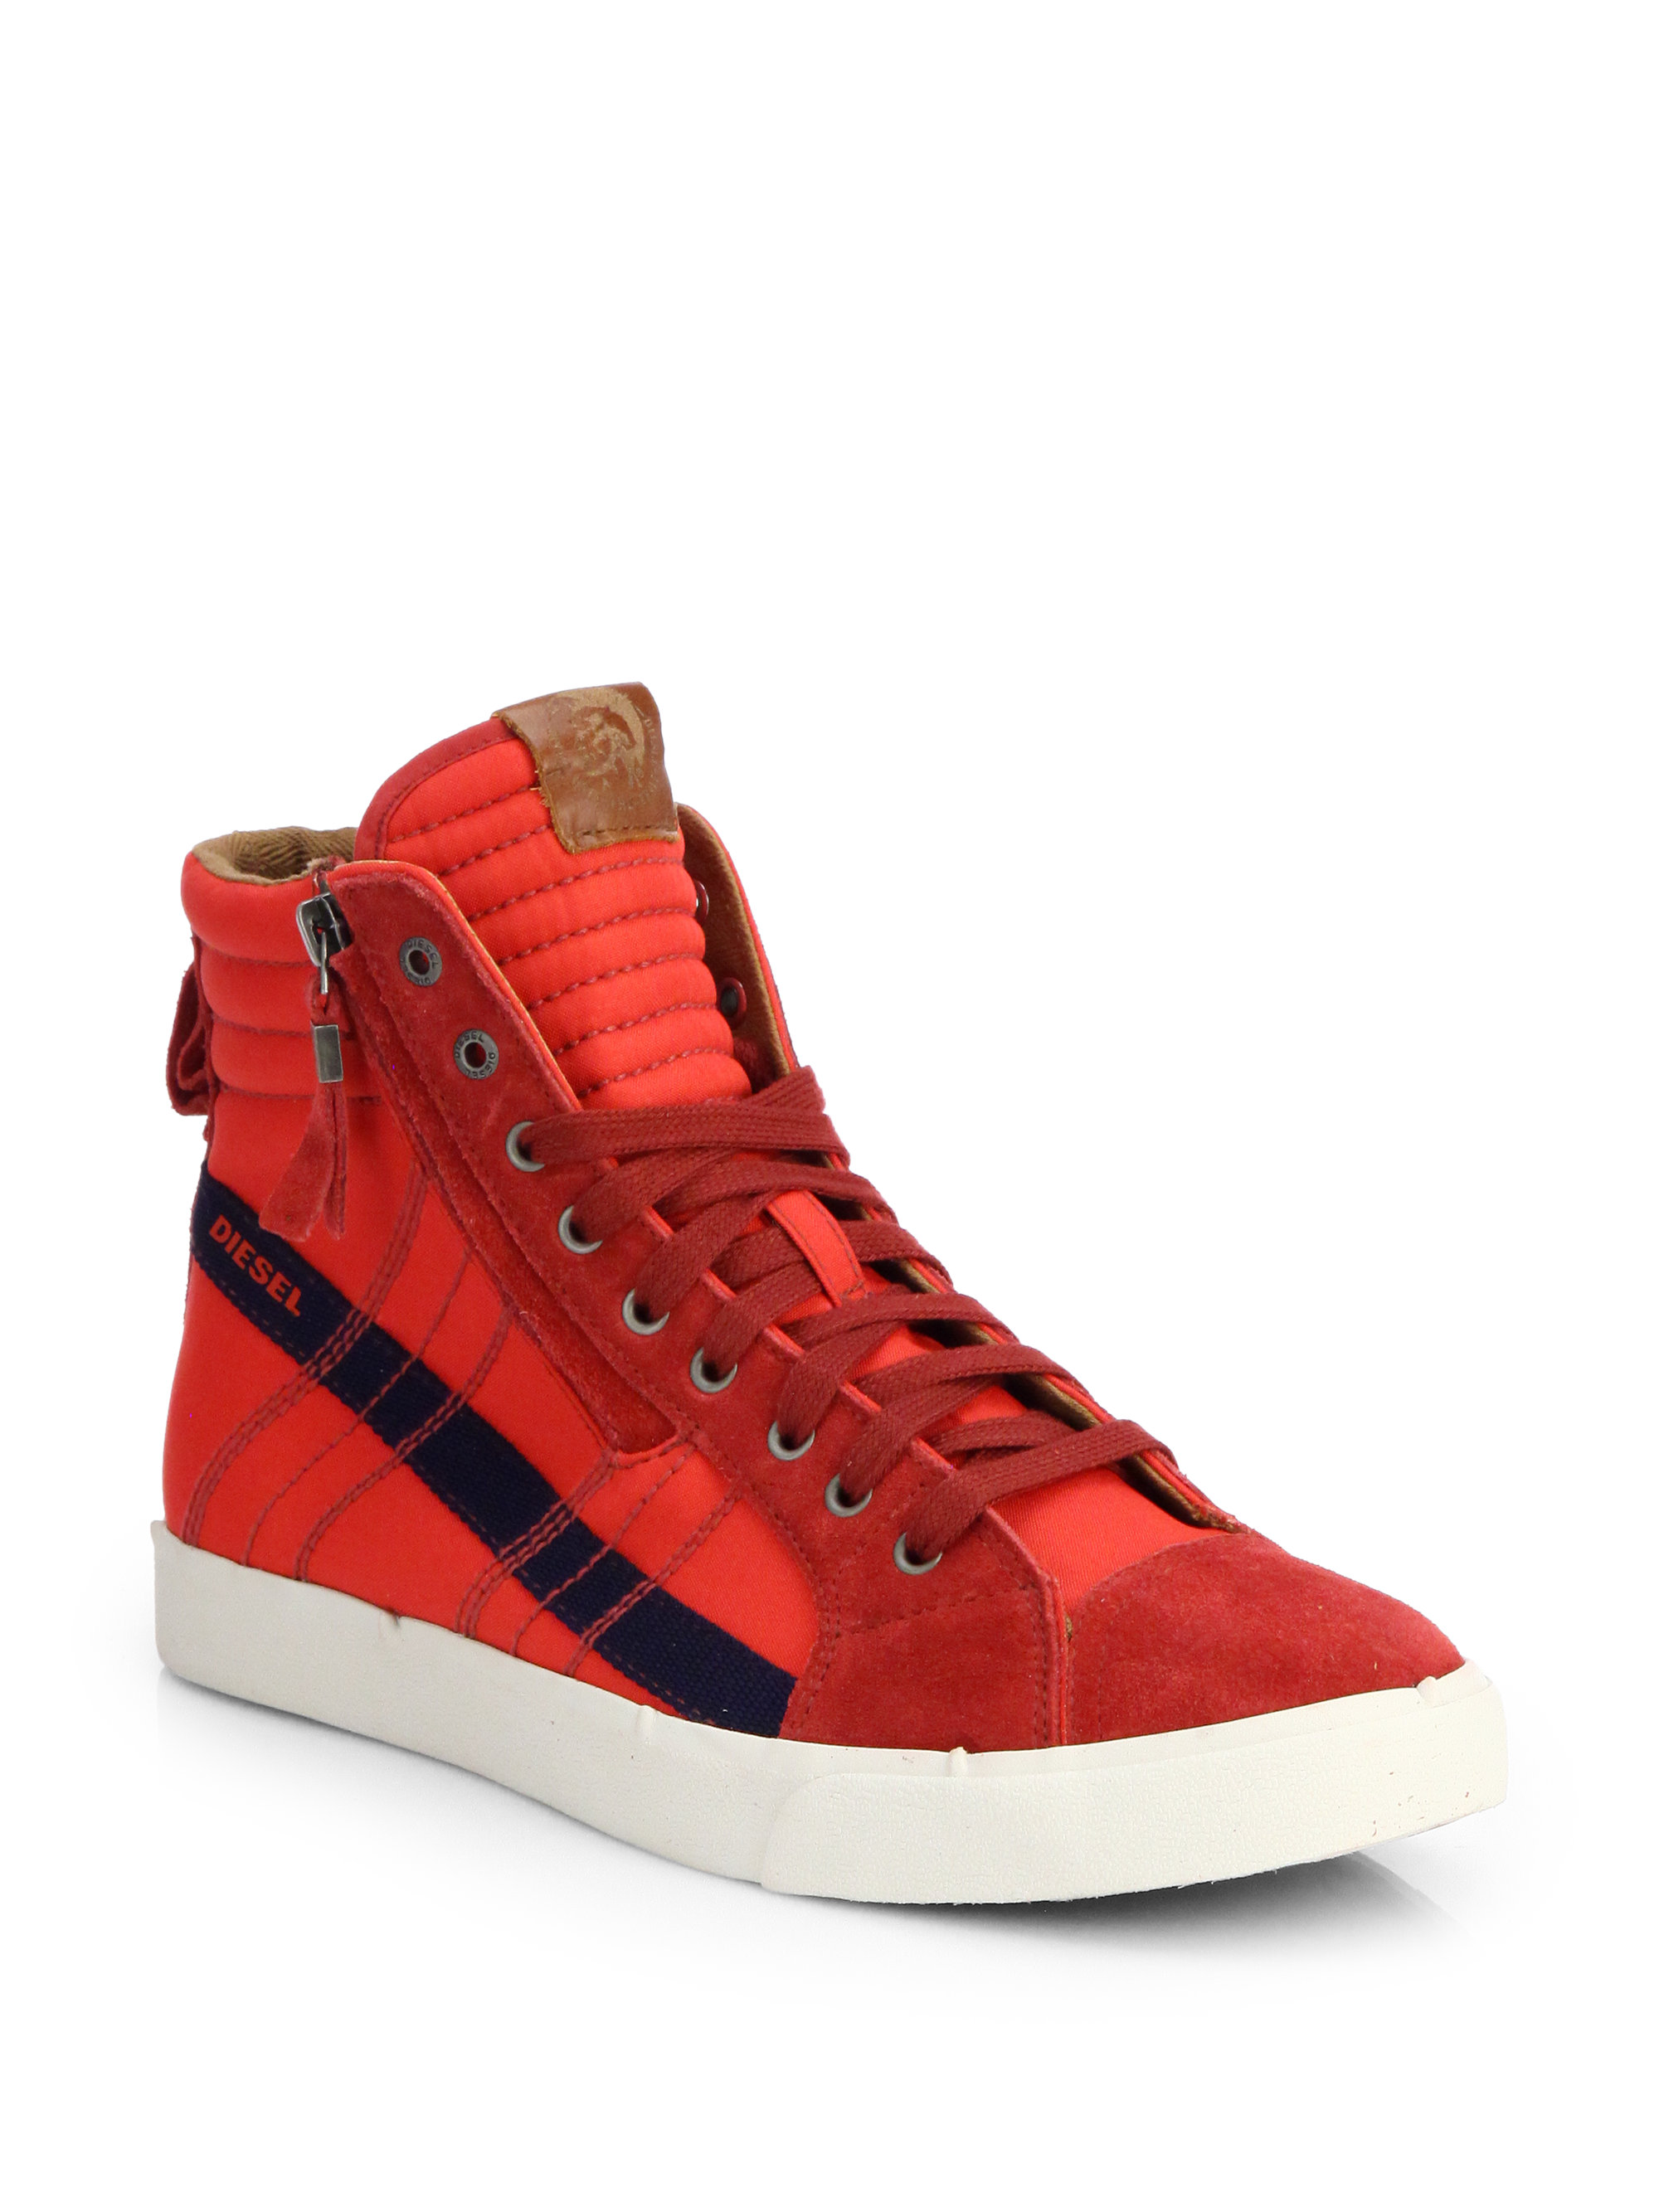 Rubber Rings For Men >> Diesel Dstring Striped Hightop Sneakers in Red for Men | Lyst